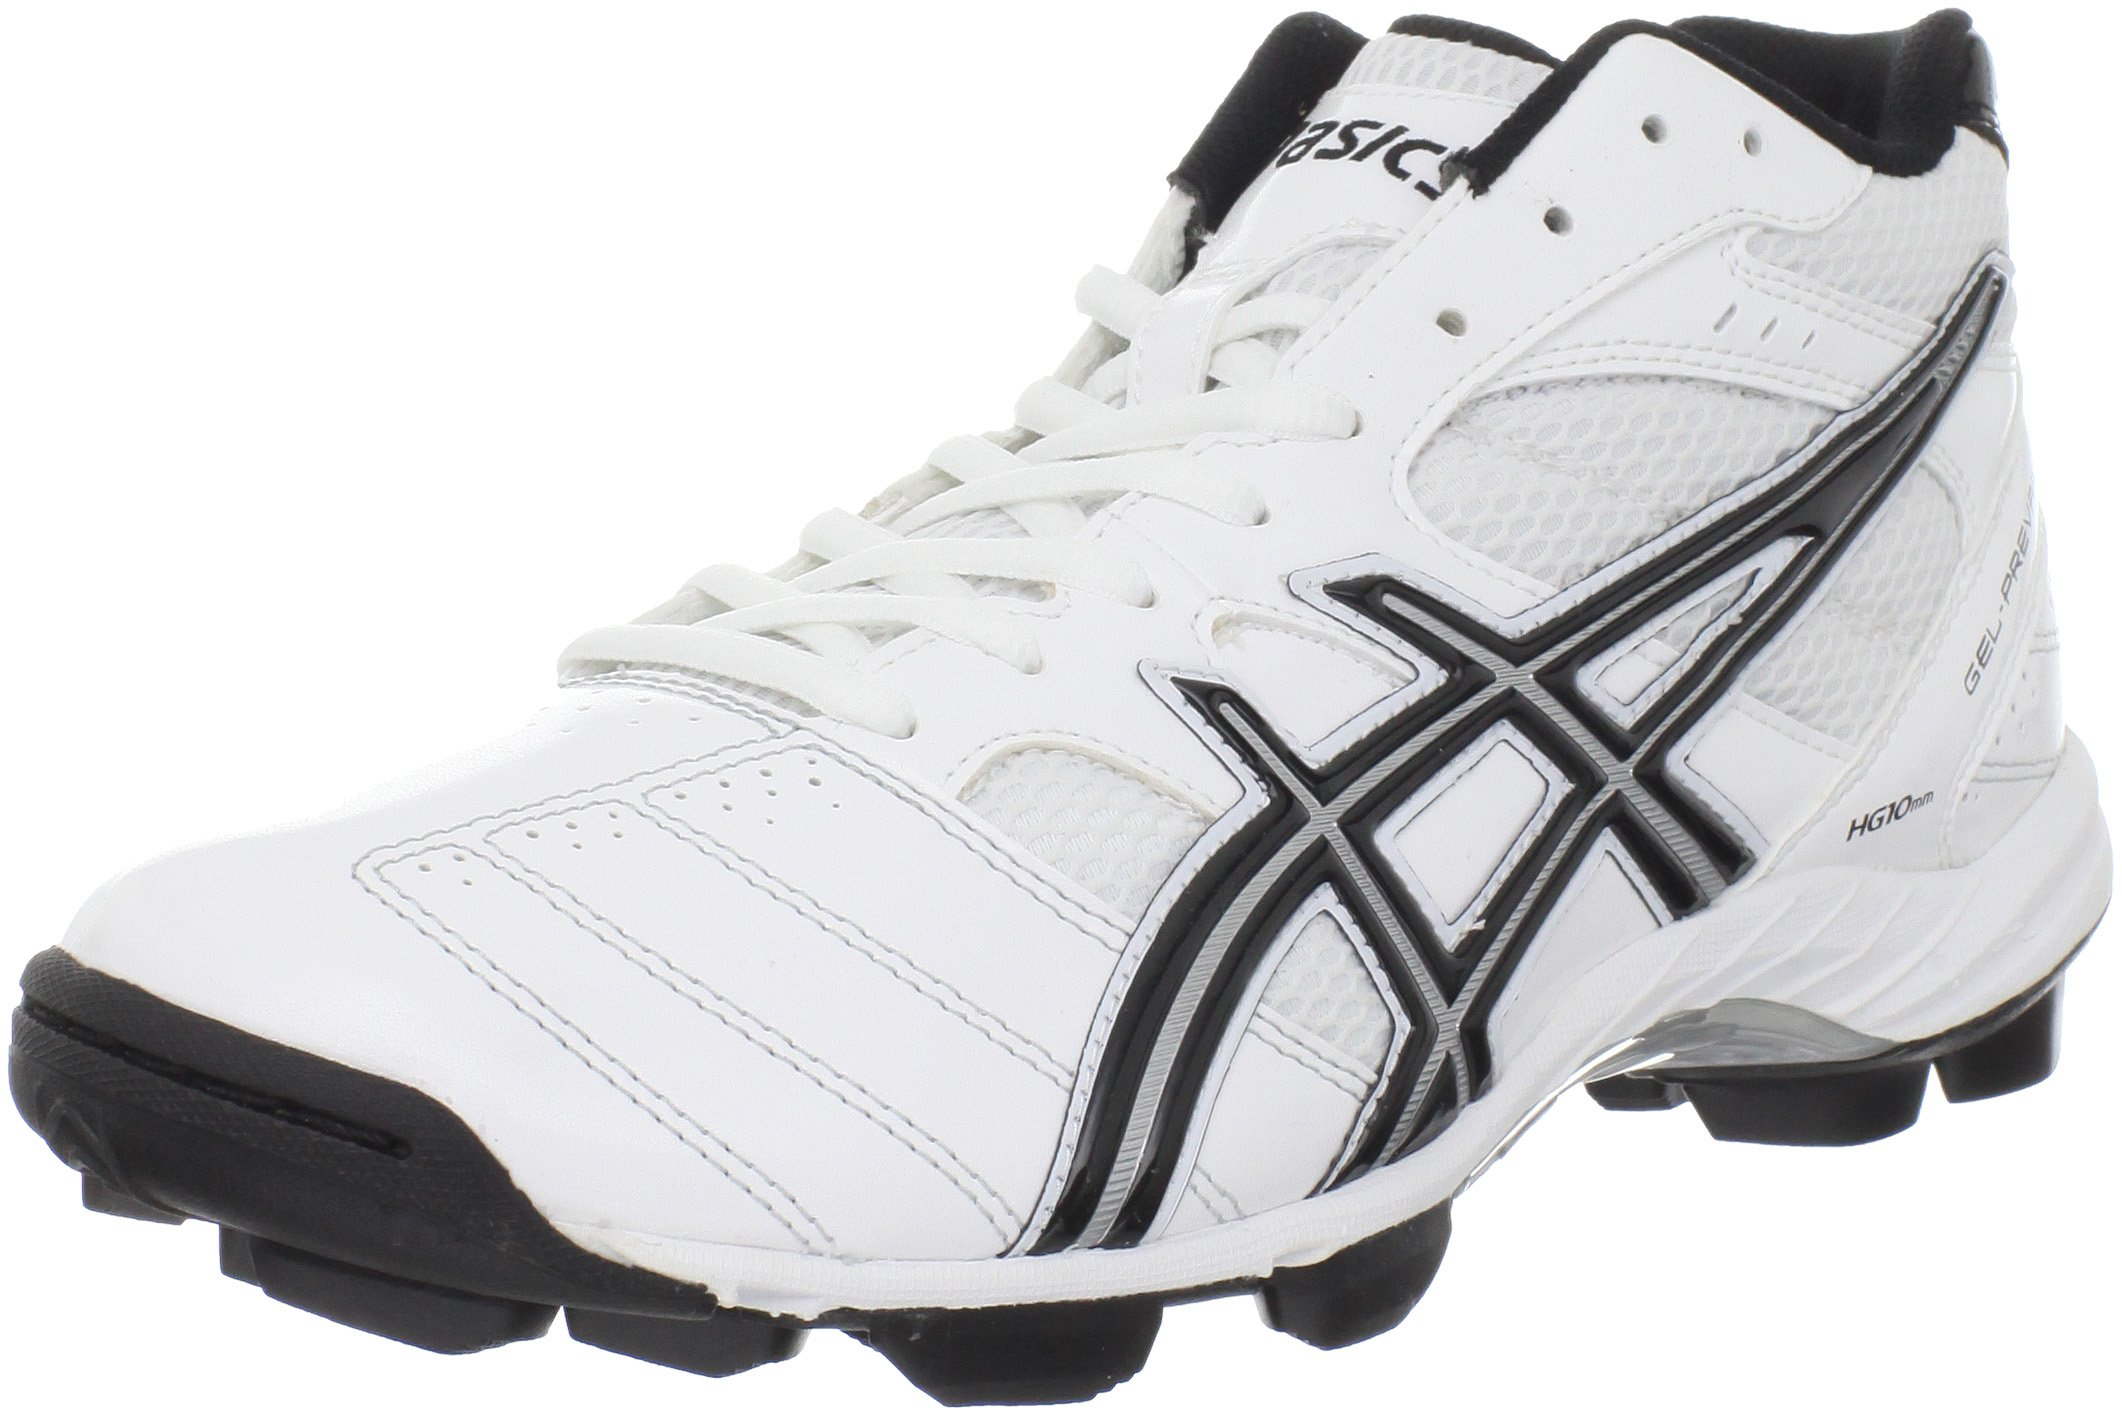 ASICS Men's GEL-Prevail Mid Lacrosse Shoe,White/Black/Silver,13 M US